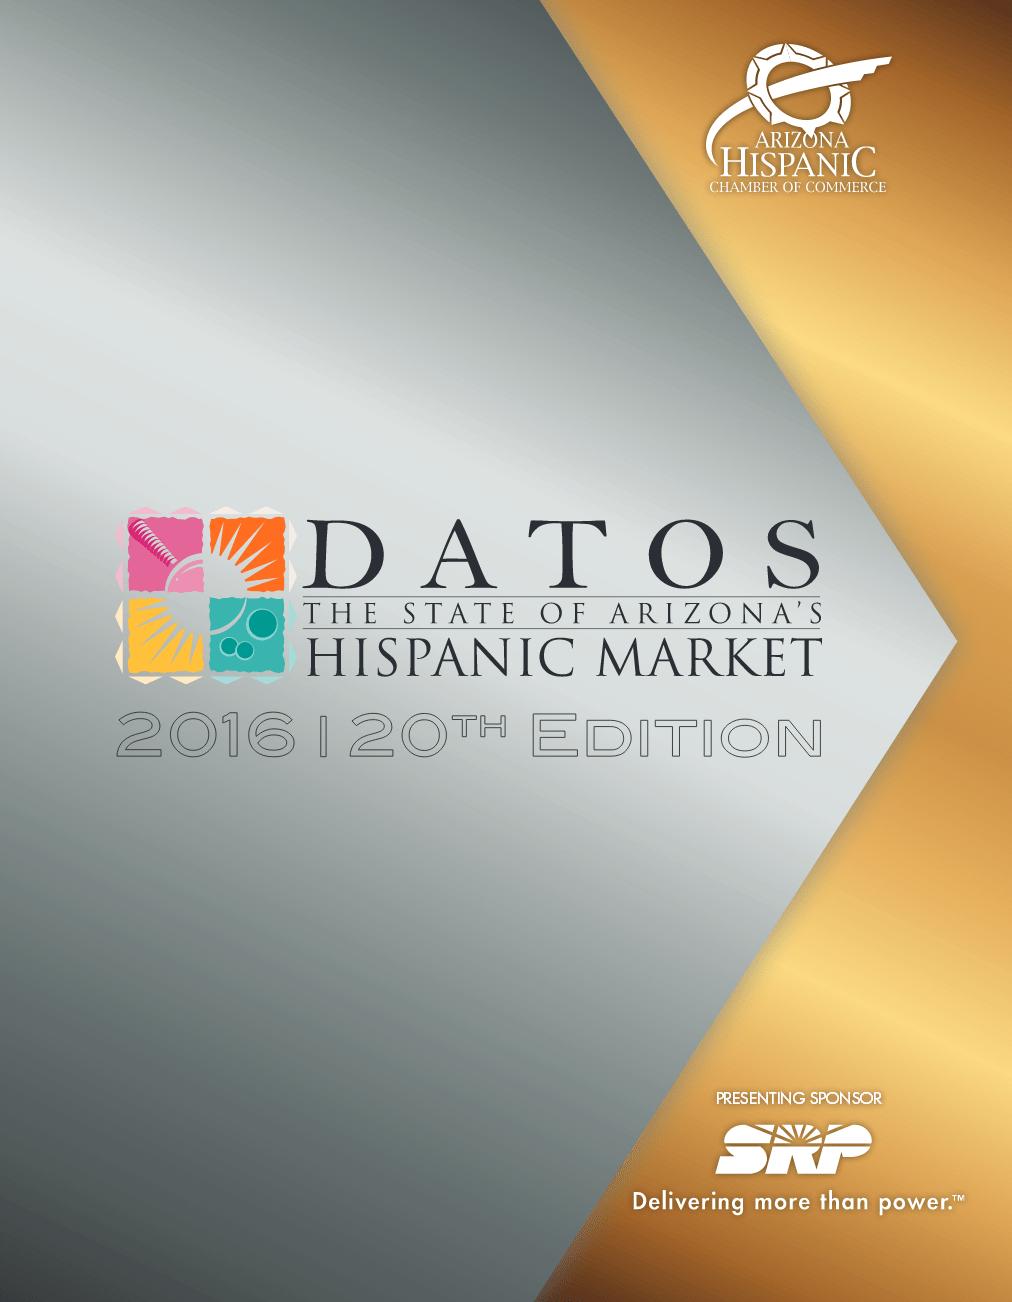 DATOS hispanic market report